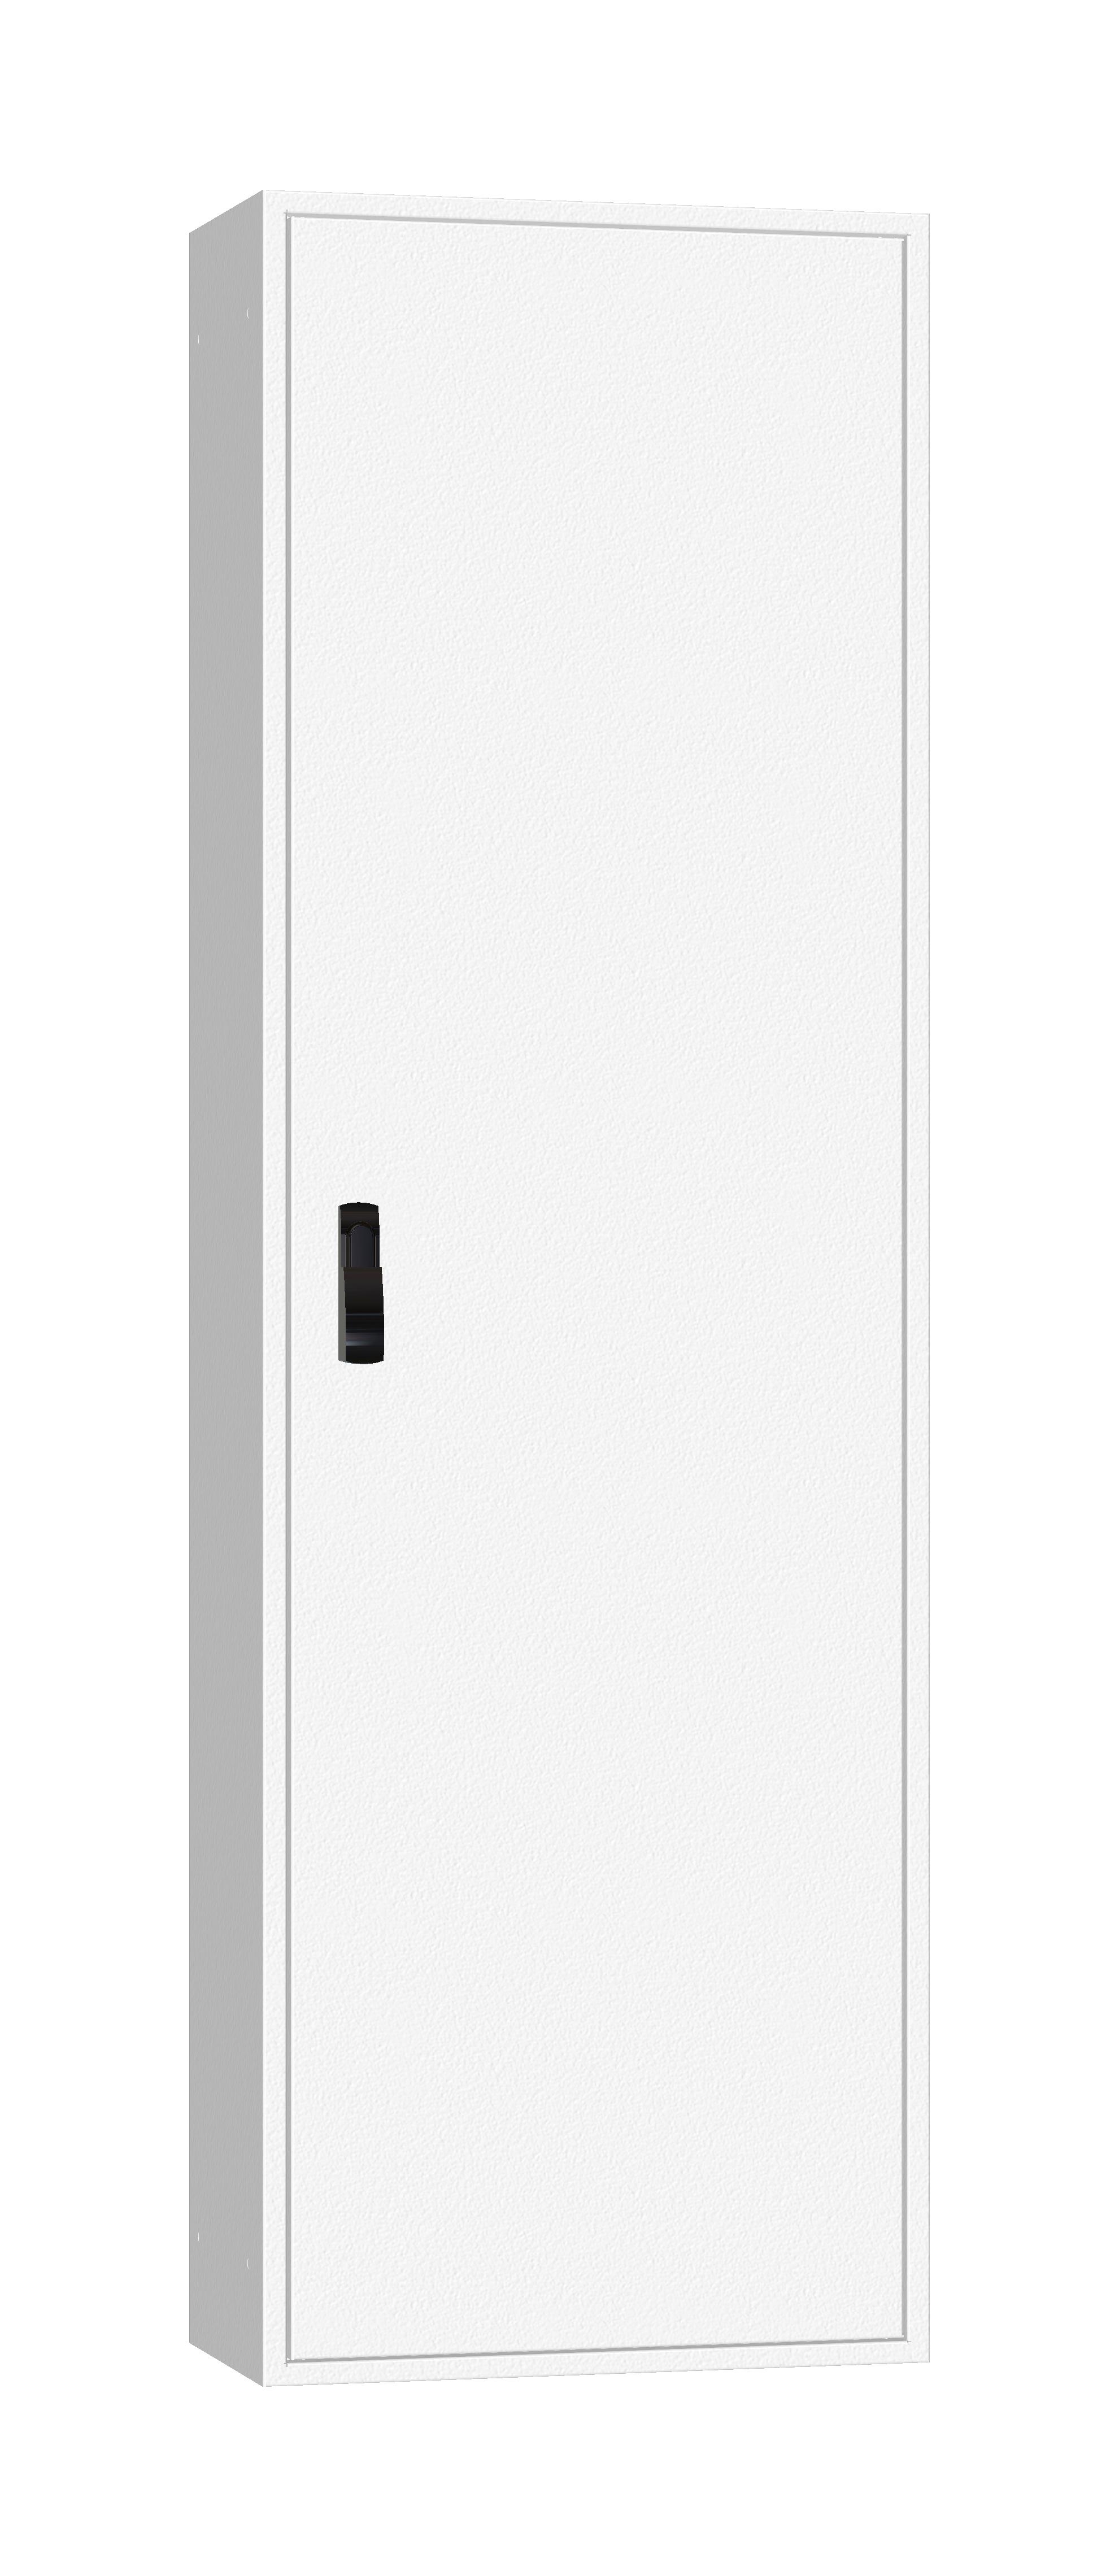 1 Stk AP-Rahmen + Tür 2A-39 T=300mm, Rückwand + Schwenkhebel, IP54 IL953239--